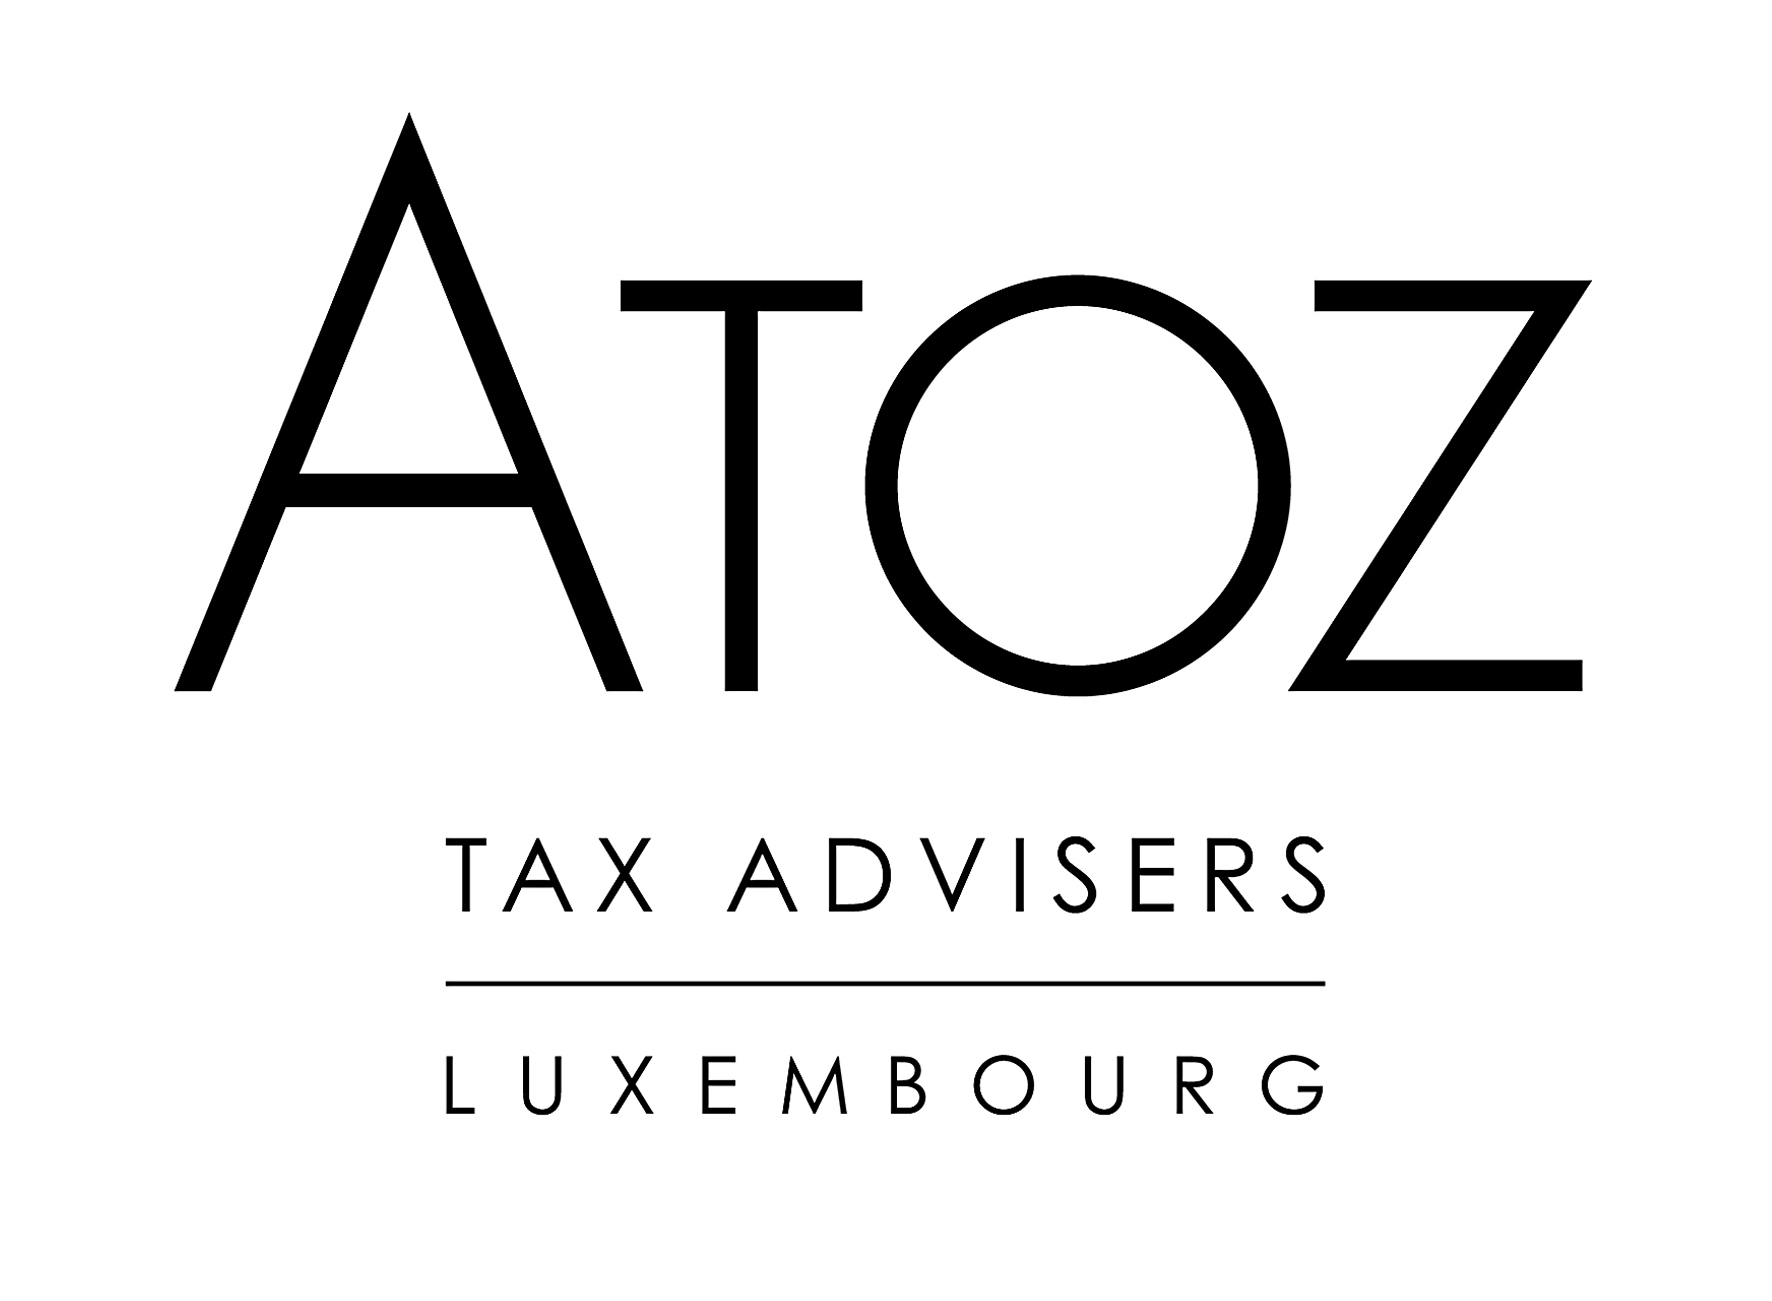 Atoz Tax advisers Luxembourg_Logo.jpg